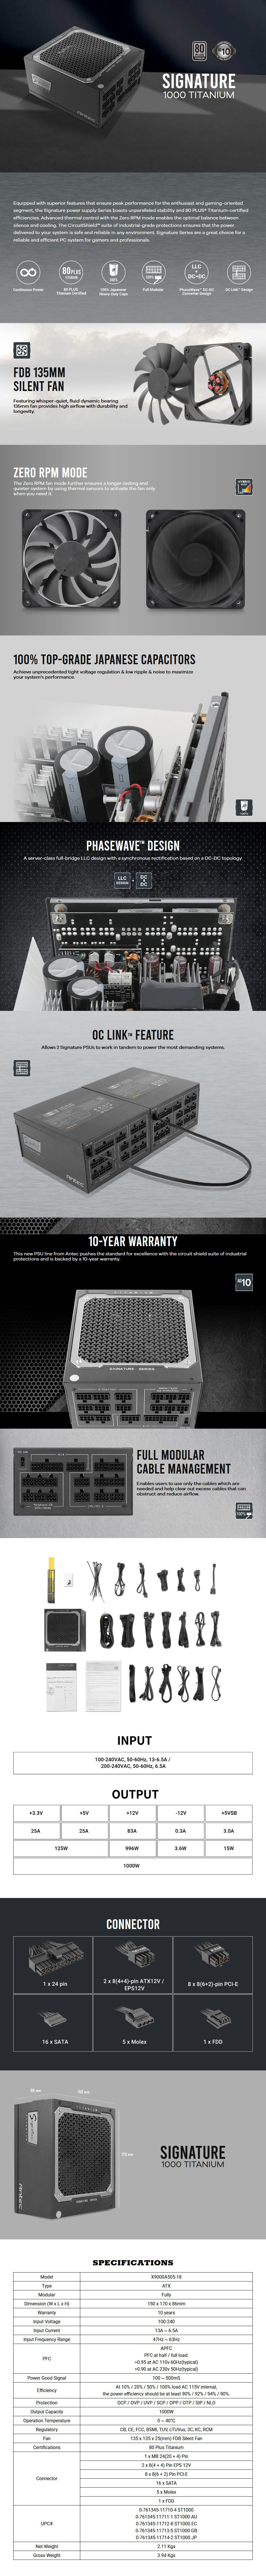 Antec Signature 1000W 80+ Titanium Fully Modular Power Supply - Overiew 1